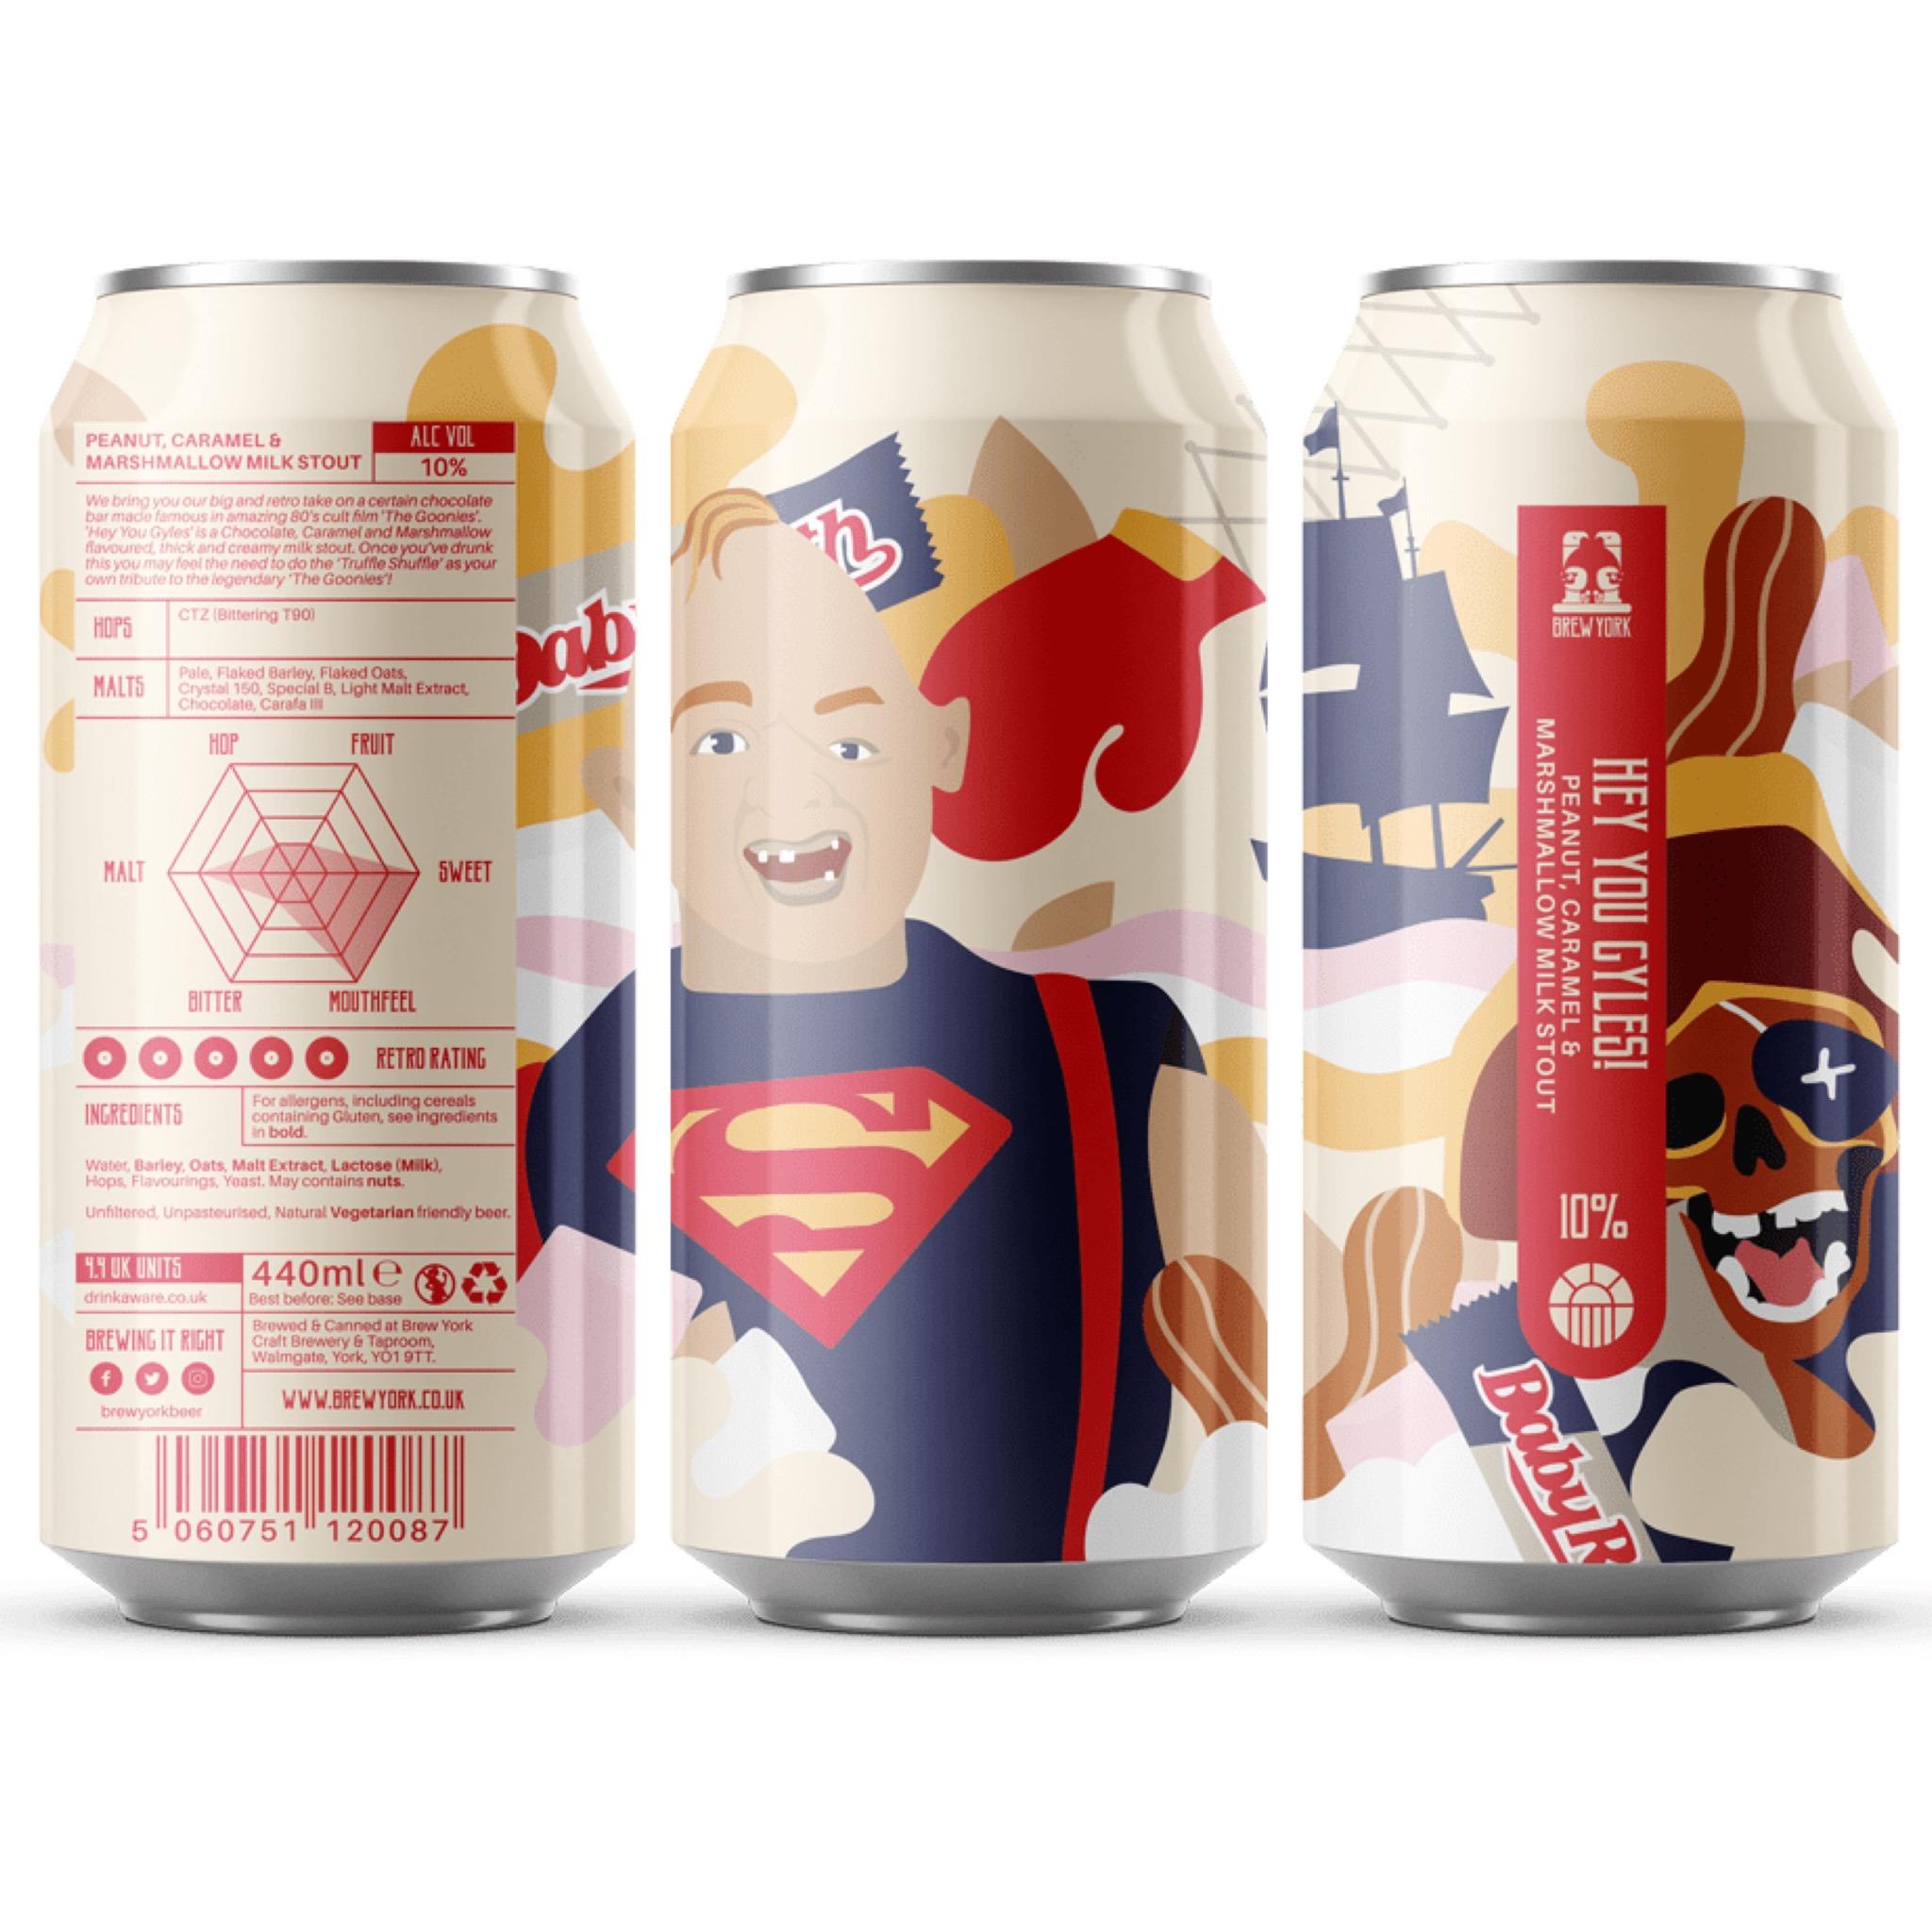 Hey You Gyles! Peanut, Caramel & Marshmallow Milk Stout 10% 440ml Brew York